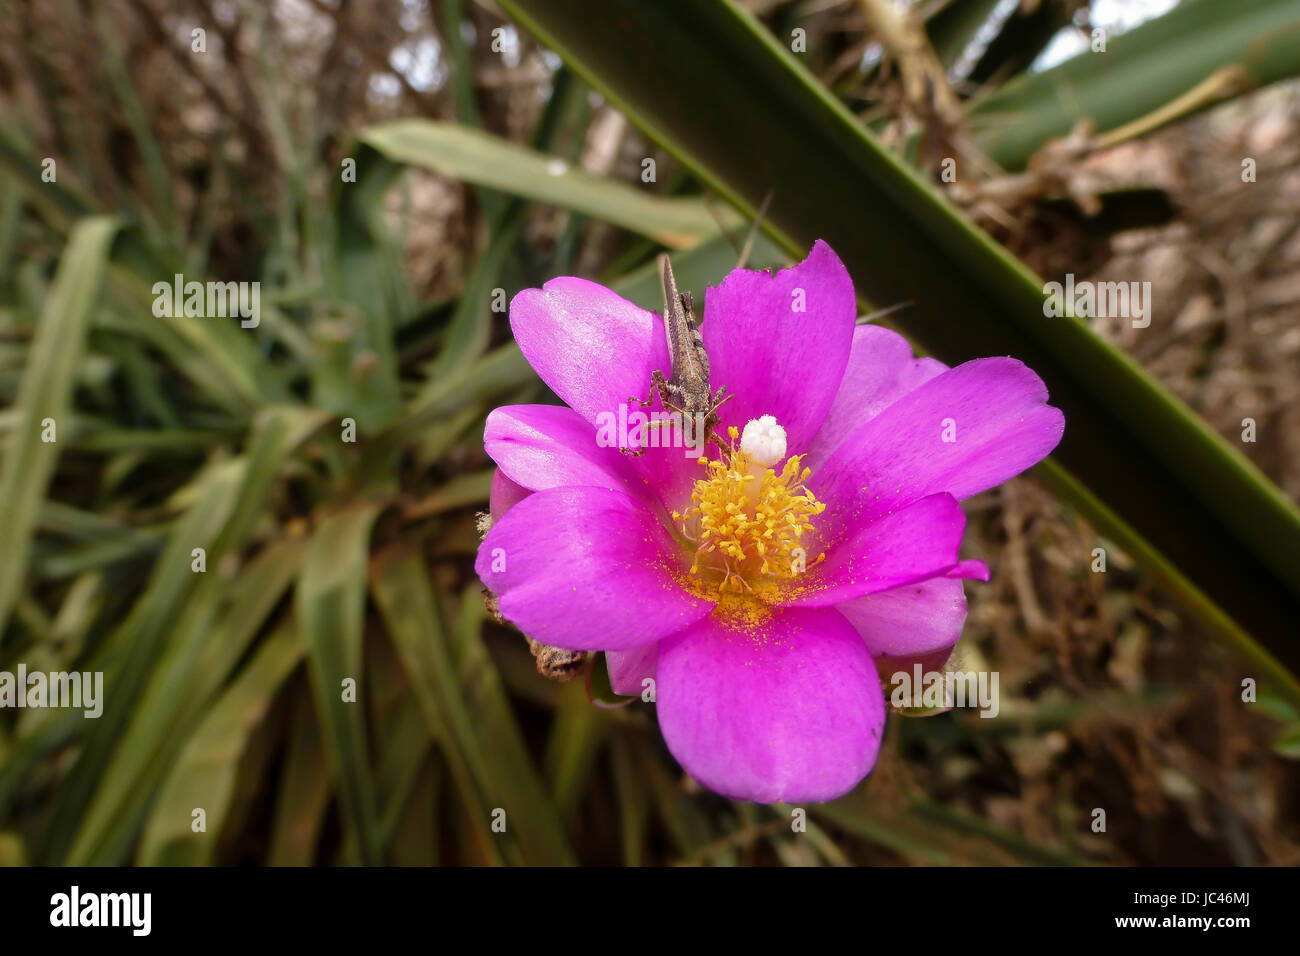 Pink flower with a grasshopper, Chapada Diamantina, Brazil - Stock Image